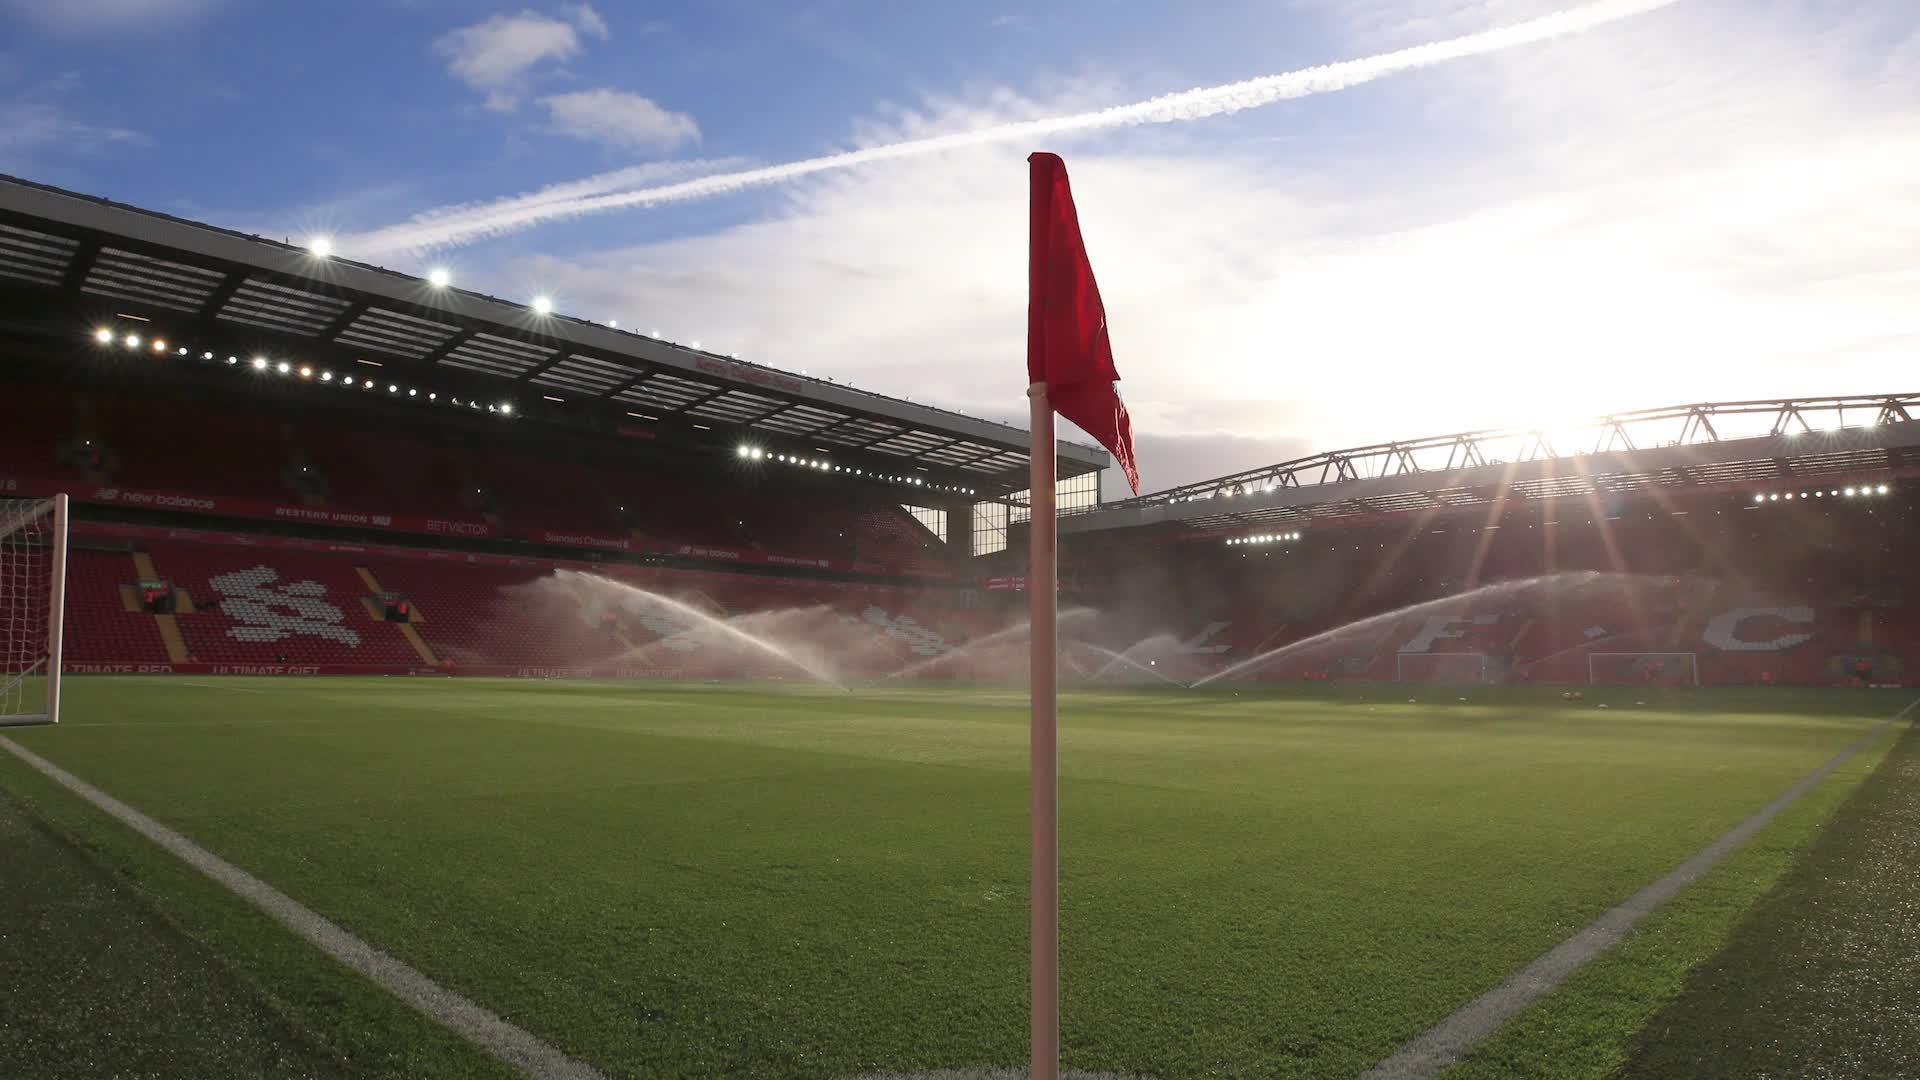 Liverpool: The season so far